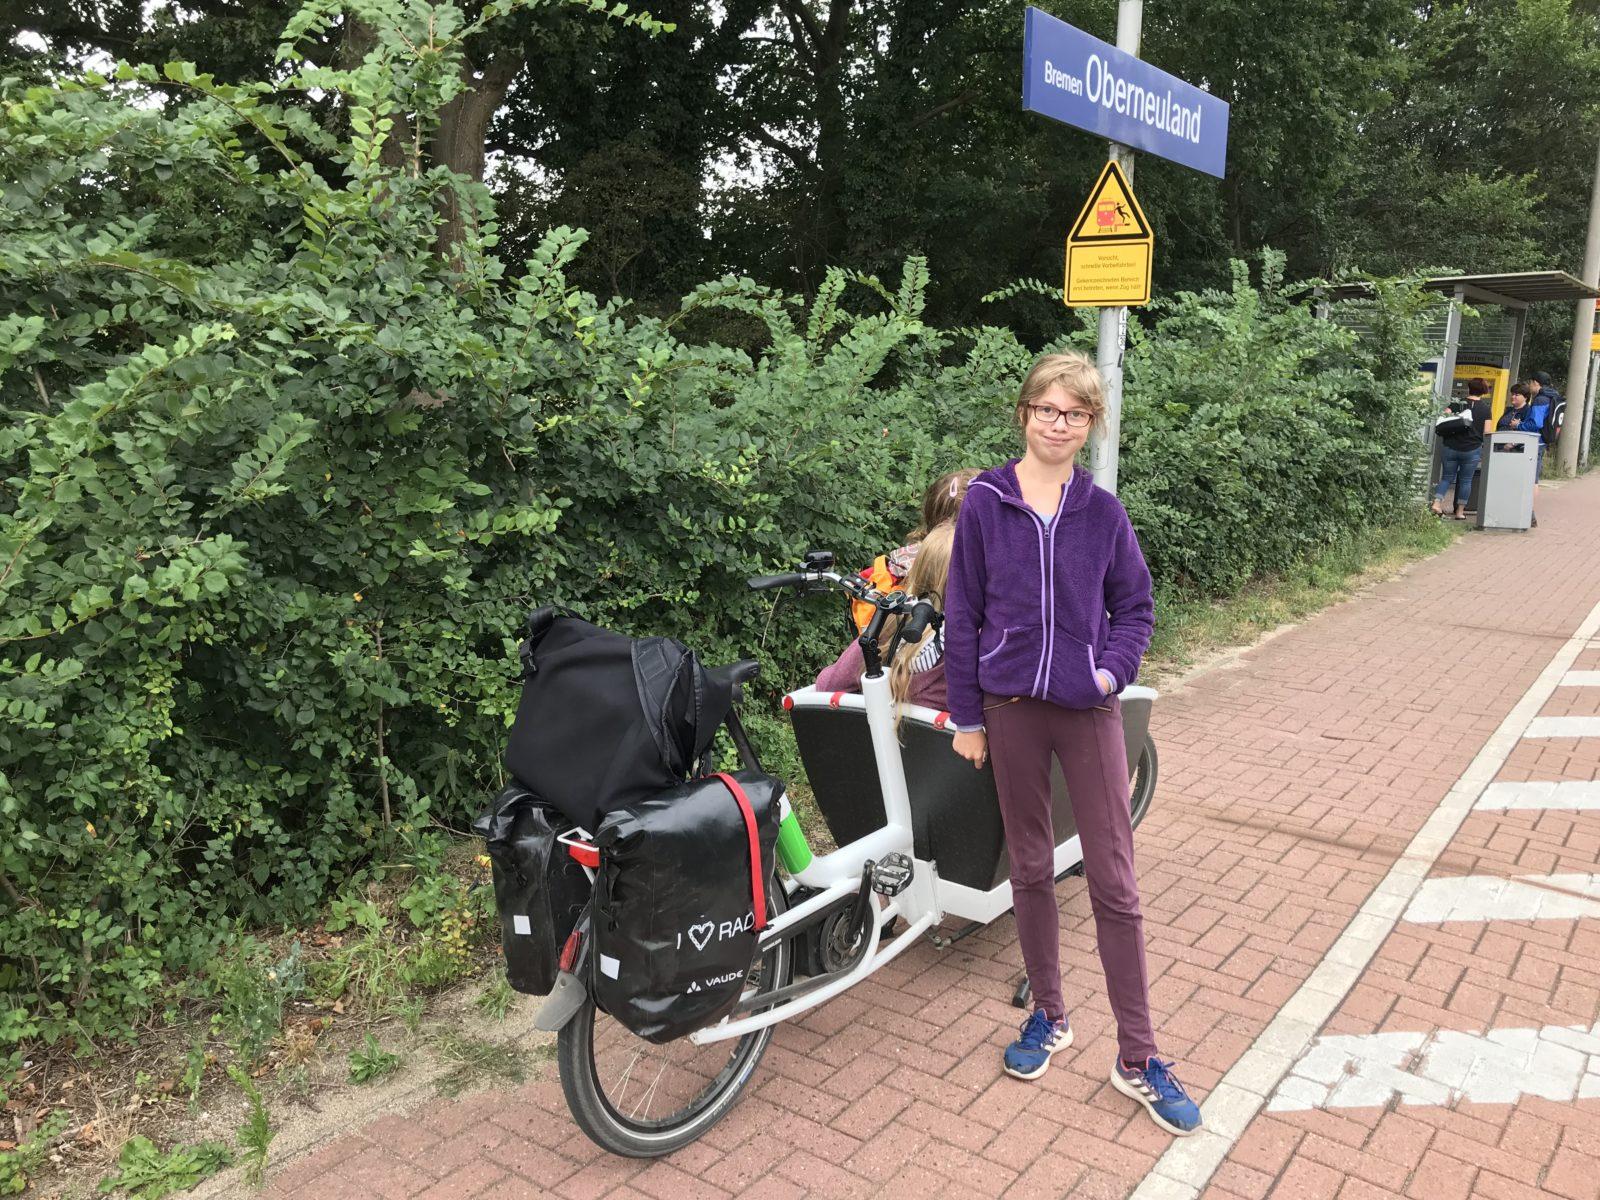 Bahnhof Bremen Oberneuland